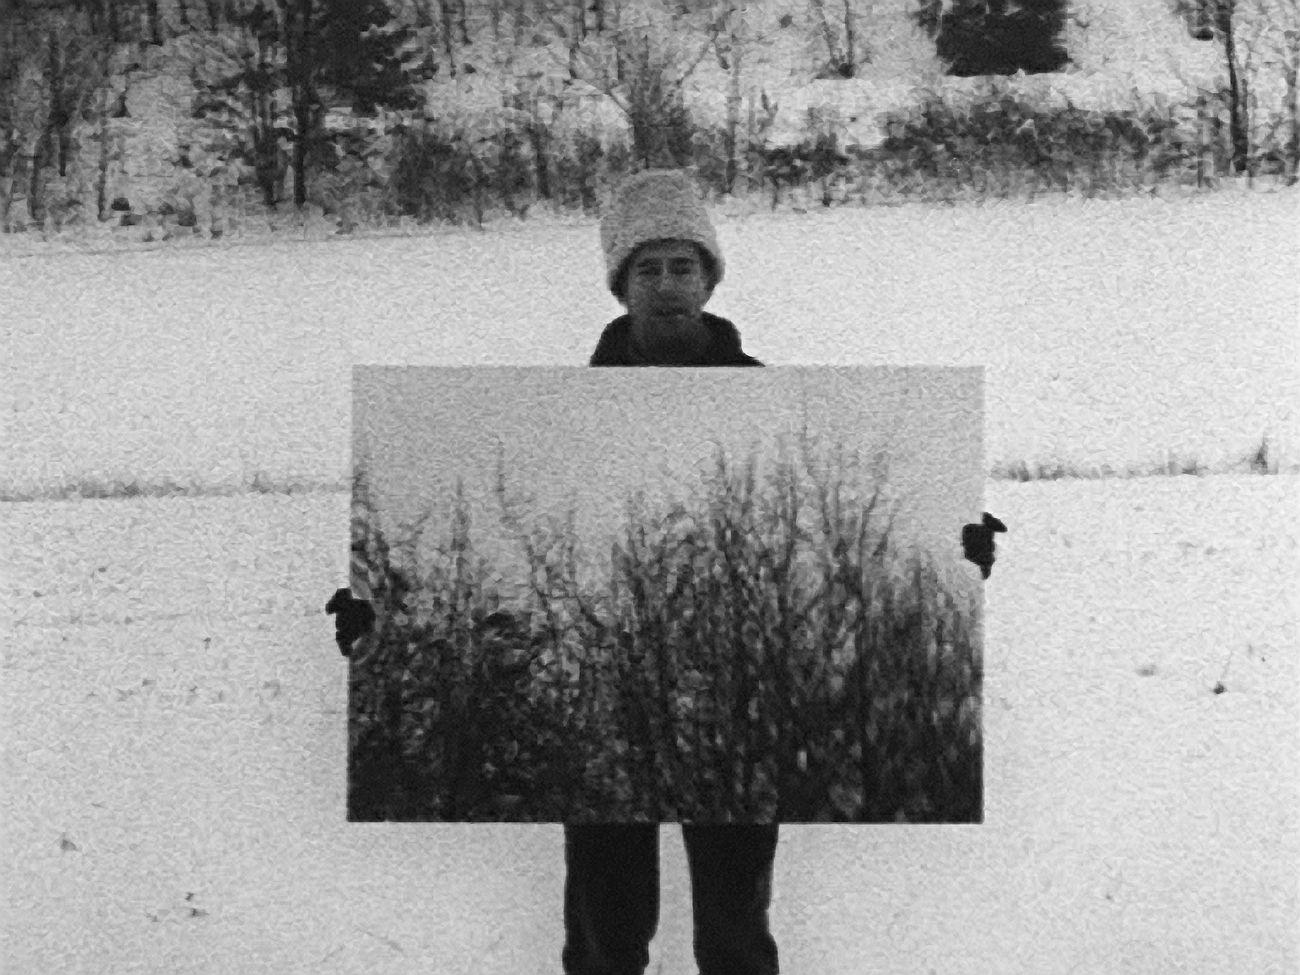 Robert Morris, Mirror, 1969, film 16 mm, durée 8 min. 31 s., collection Estate of Robert Morris, Courtesy Castelli Gallery, New York © Adagp, Paris 2020